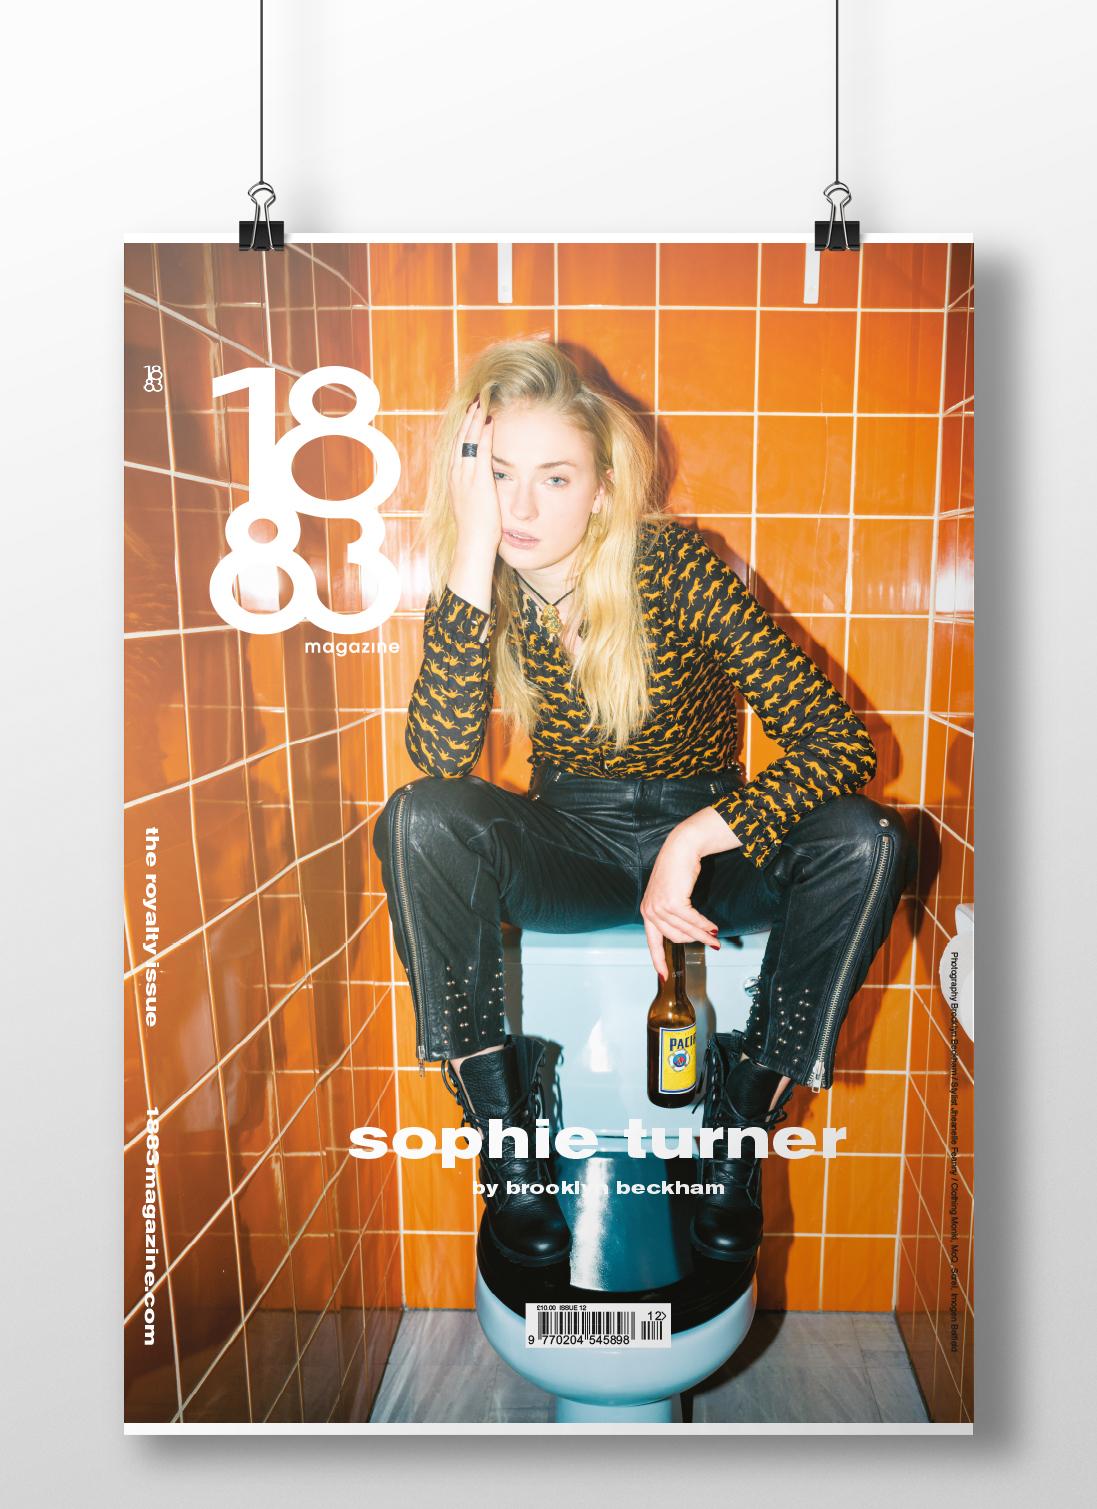 Sophie Turner cover poster p5